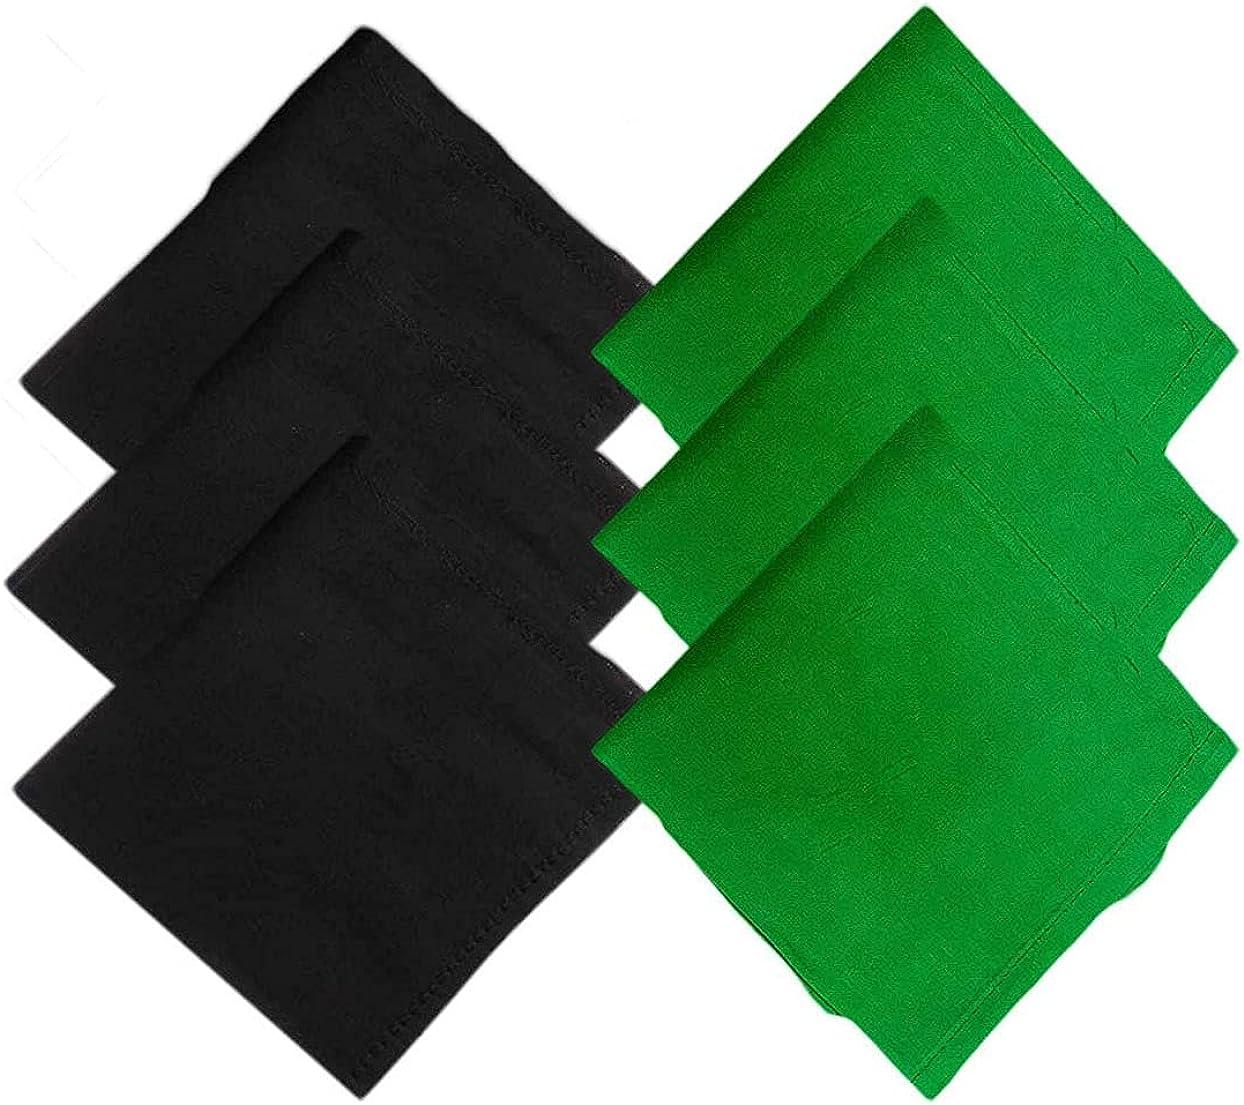 Kalagiri Cotton Premium Collection Black And Green Handkerchiefs Hanky Set For Men - Pack of 6 Pcs